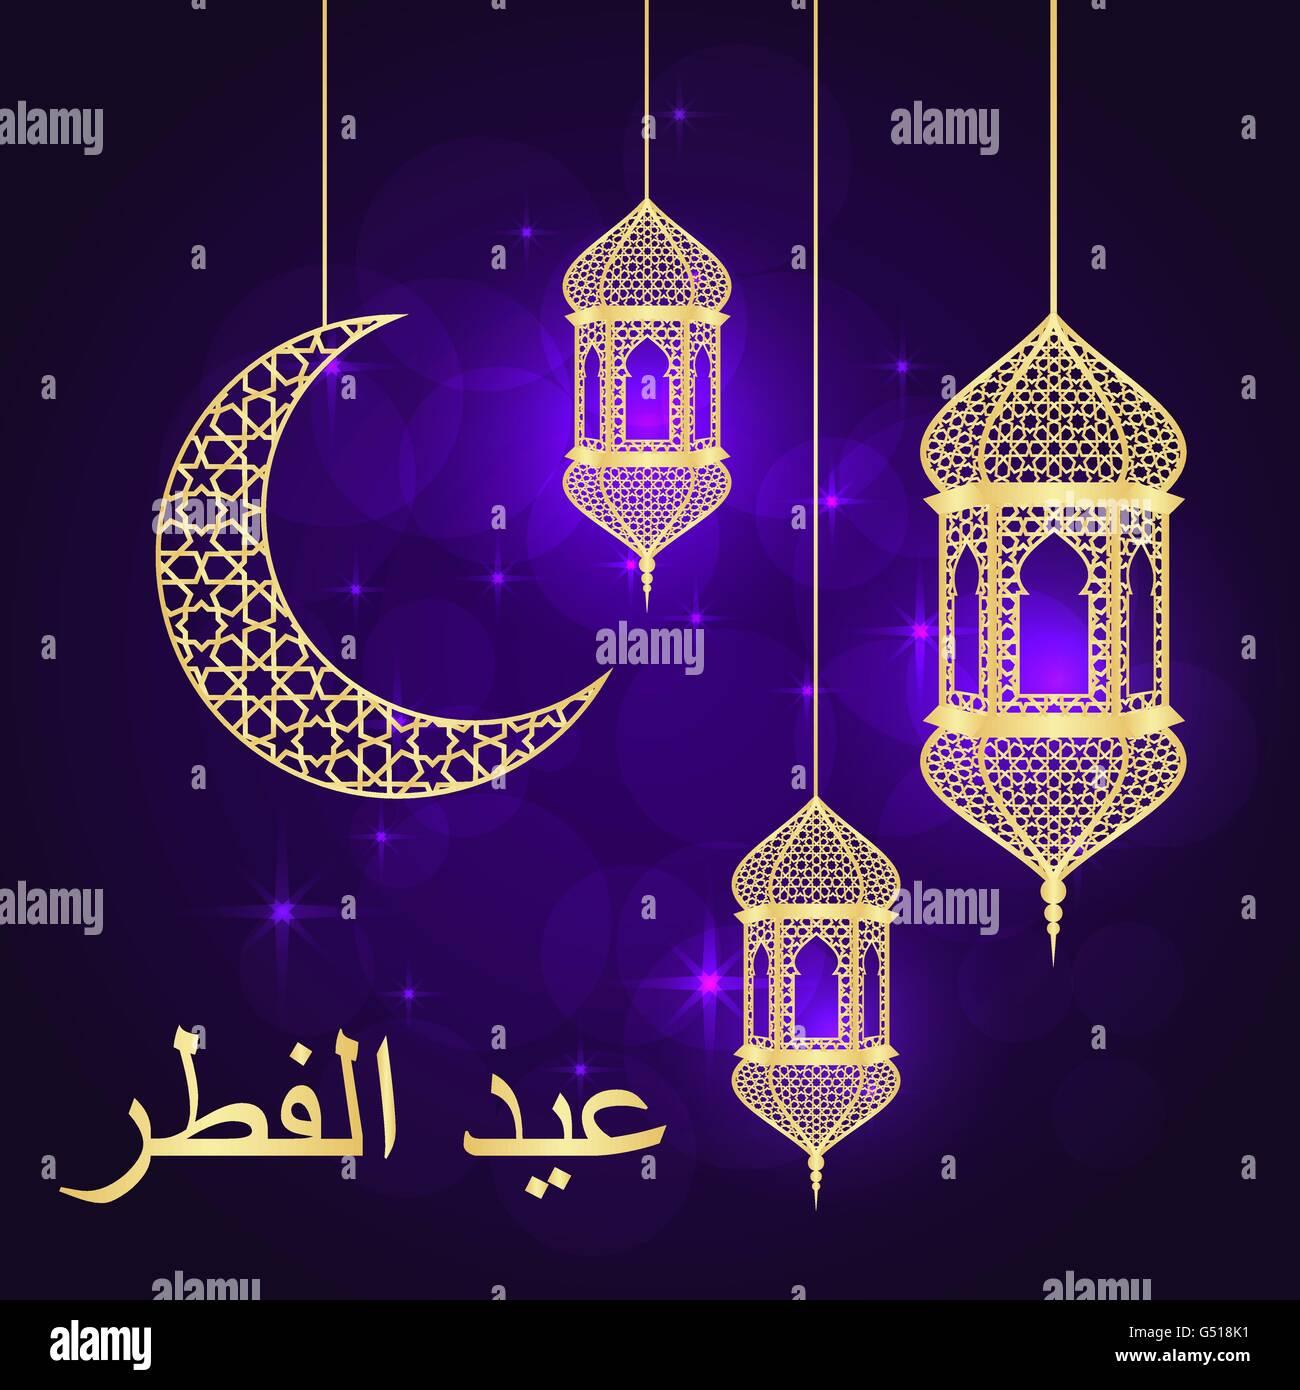 Amazing Different Eid Al-Fitr Greeting - eid-al-fitr-greeting-G518K1  Graphic_765684 .jpg